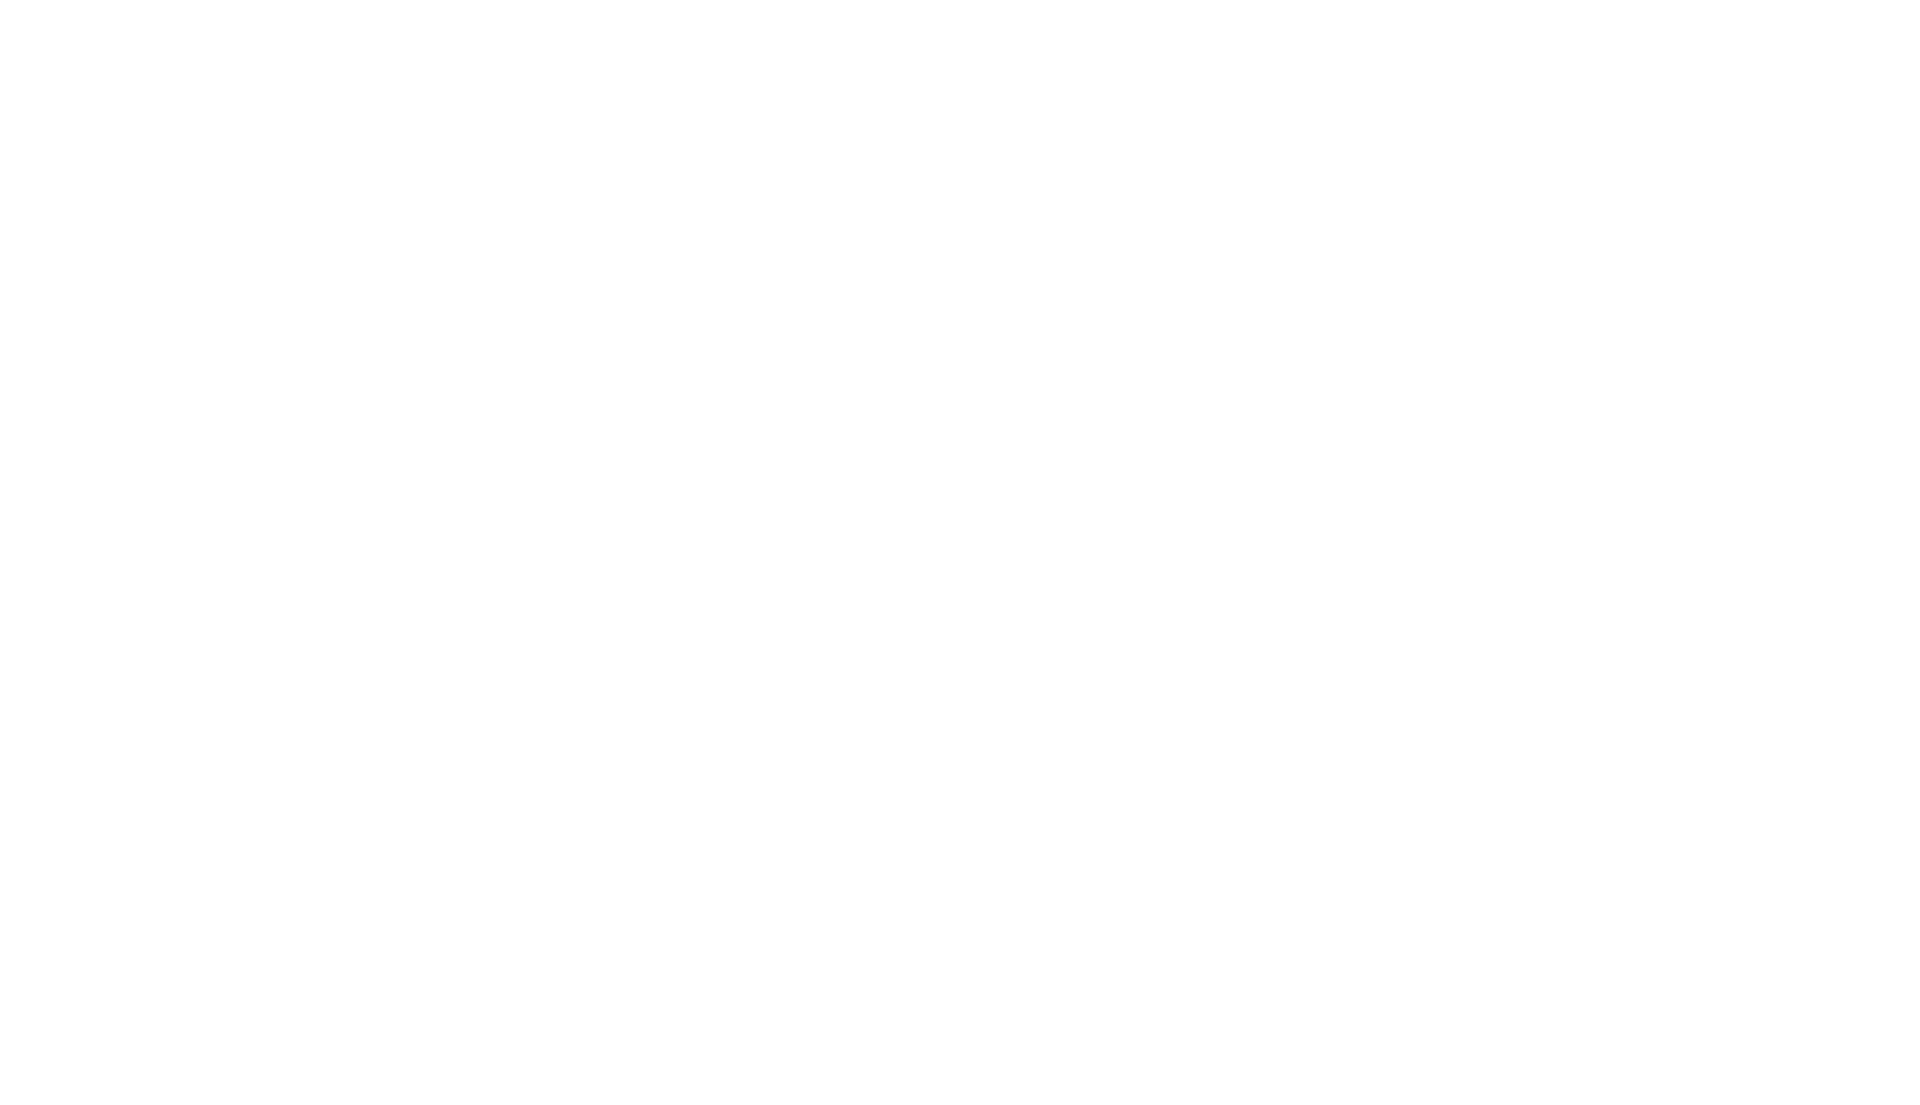 logo-wi-builders-assoc